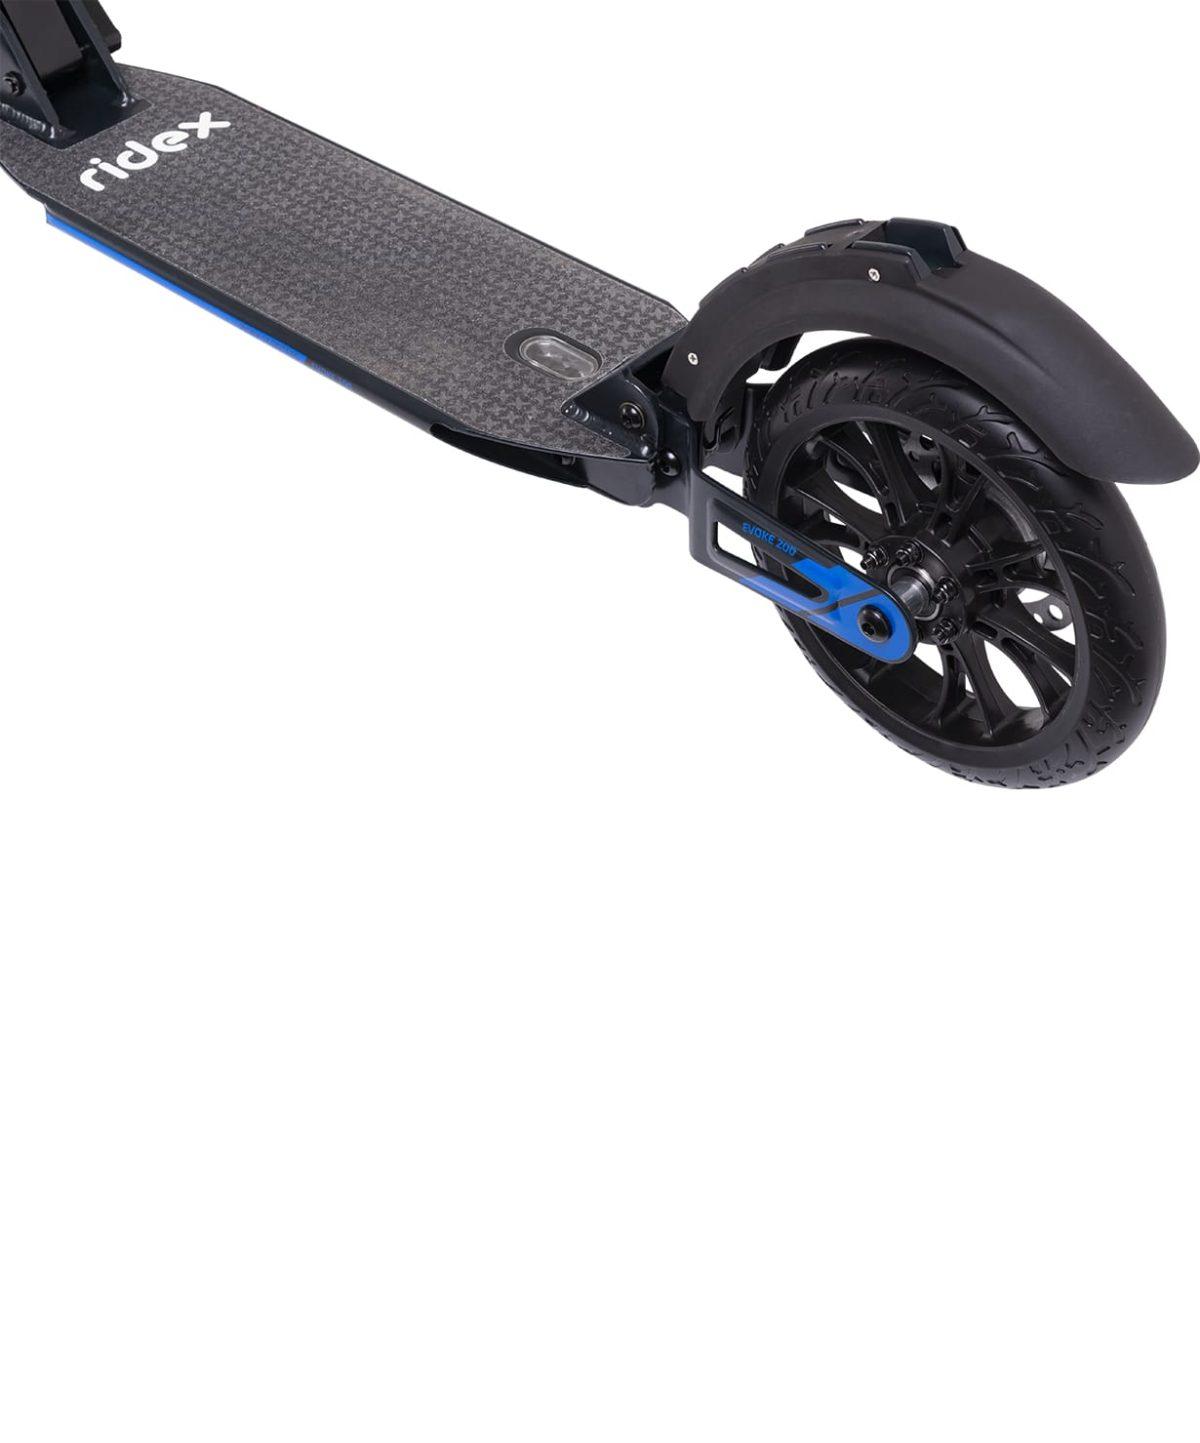 RIDEX Evoke Самокат 2-колесный с дисковым тормозом 200 мм  Evoke: синий - 5